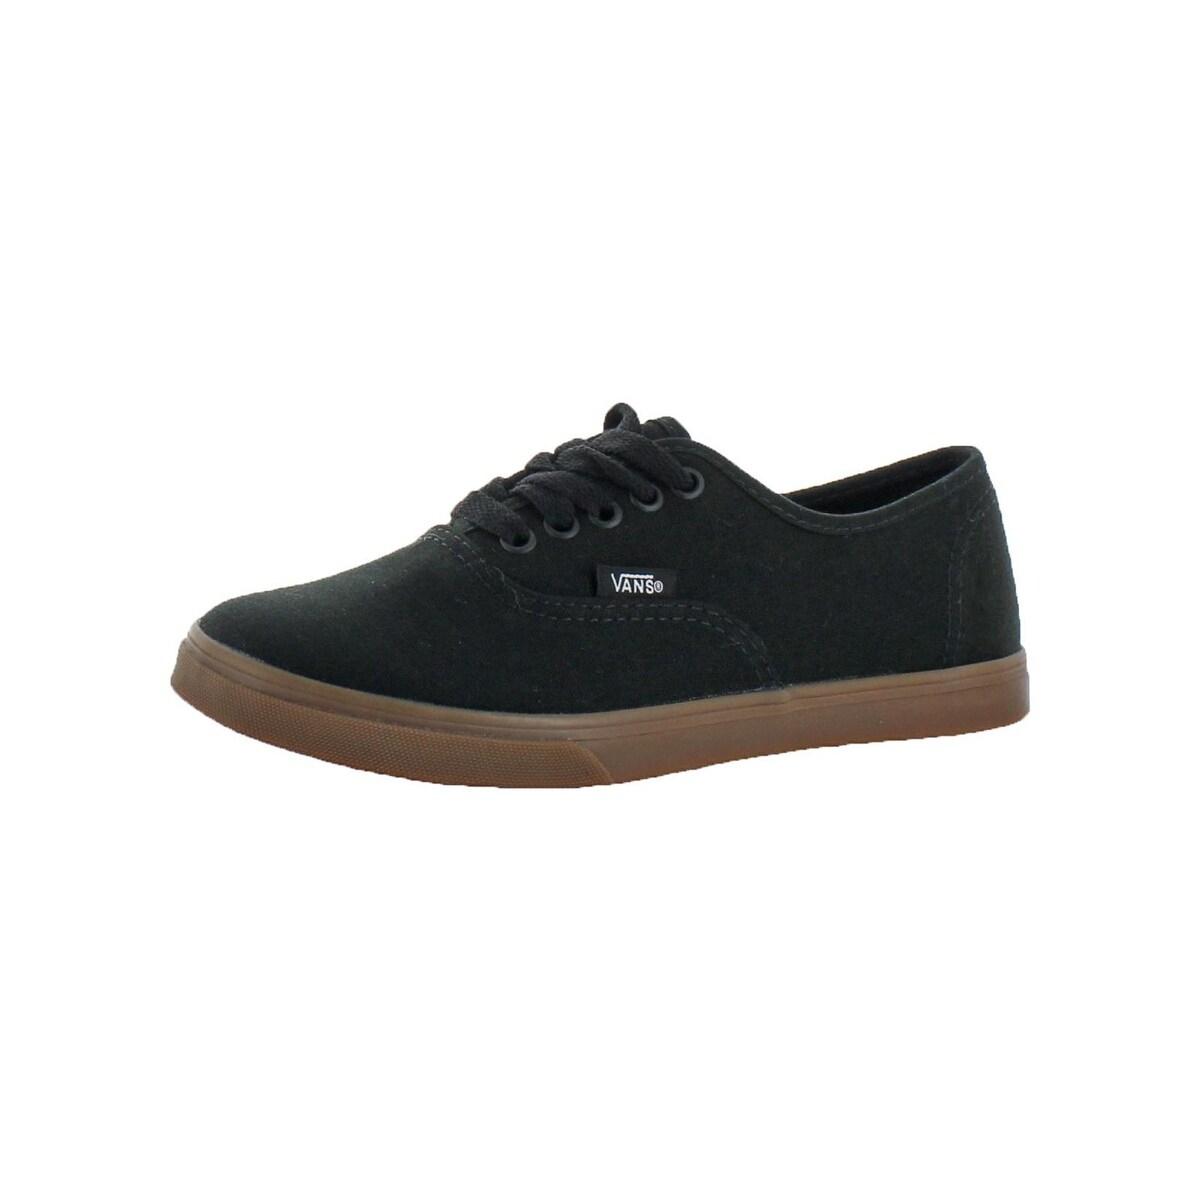 3f296be524b Shop Vans Womens Authentic Lo Pro Skate Shoes Classic Low Top - Free ...